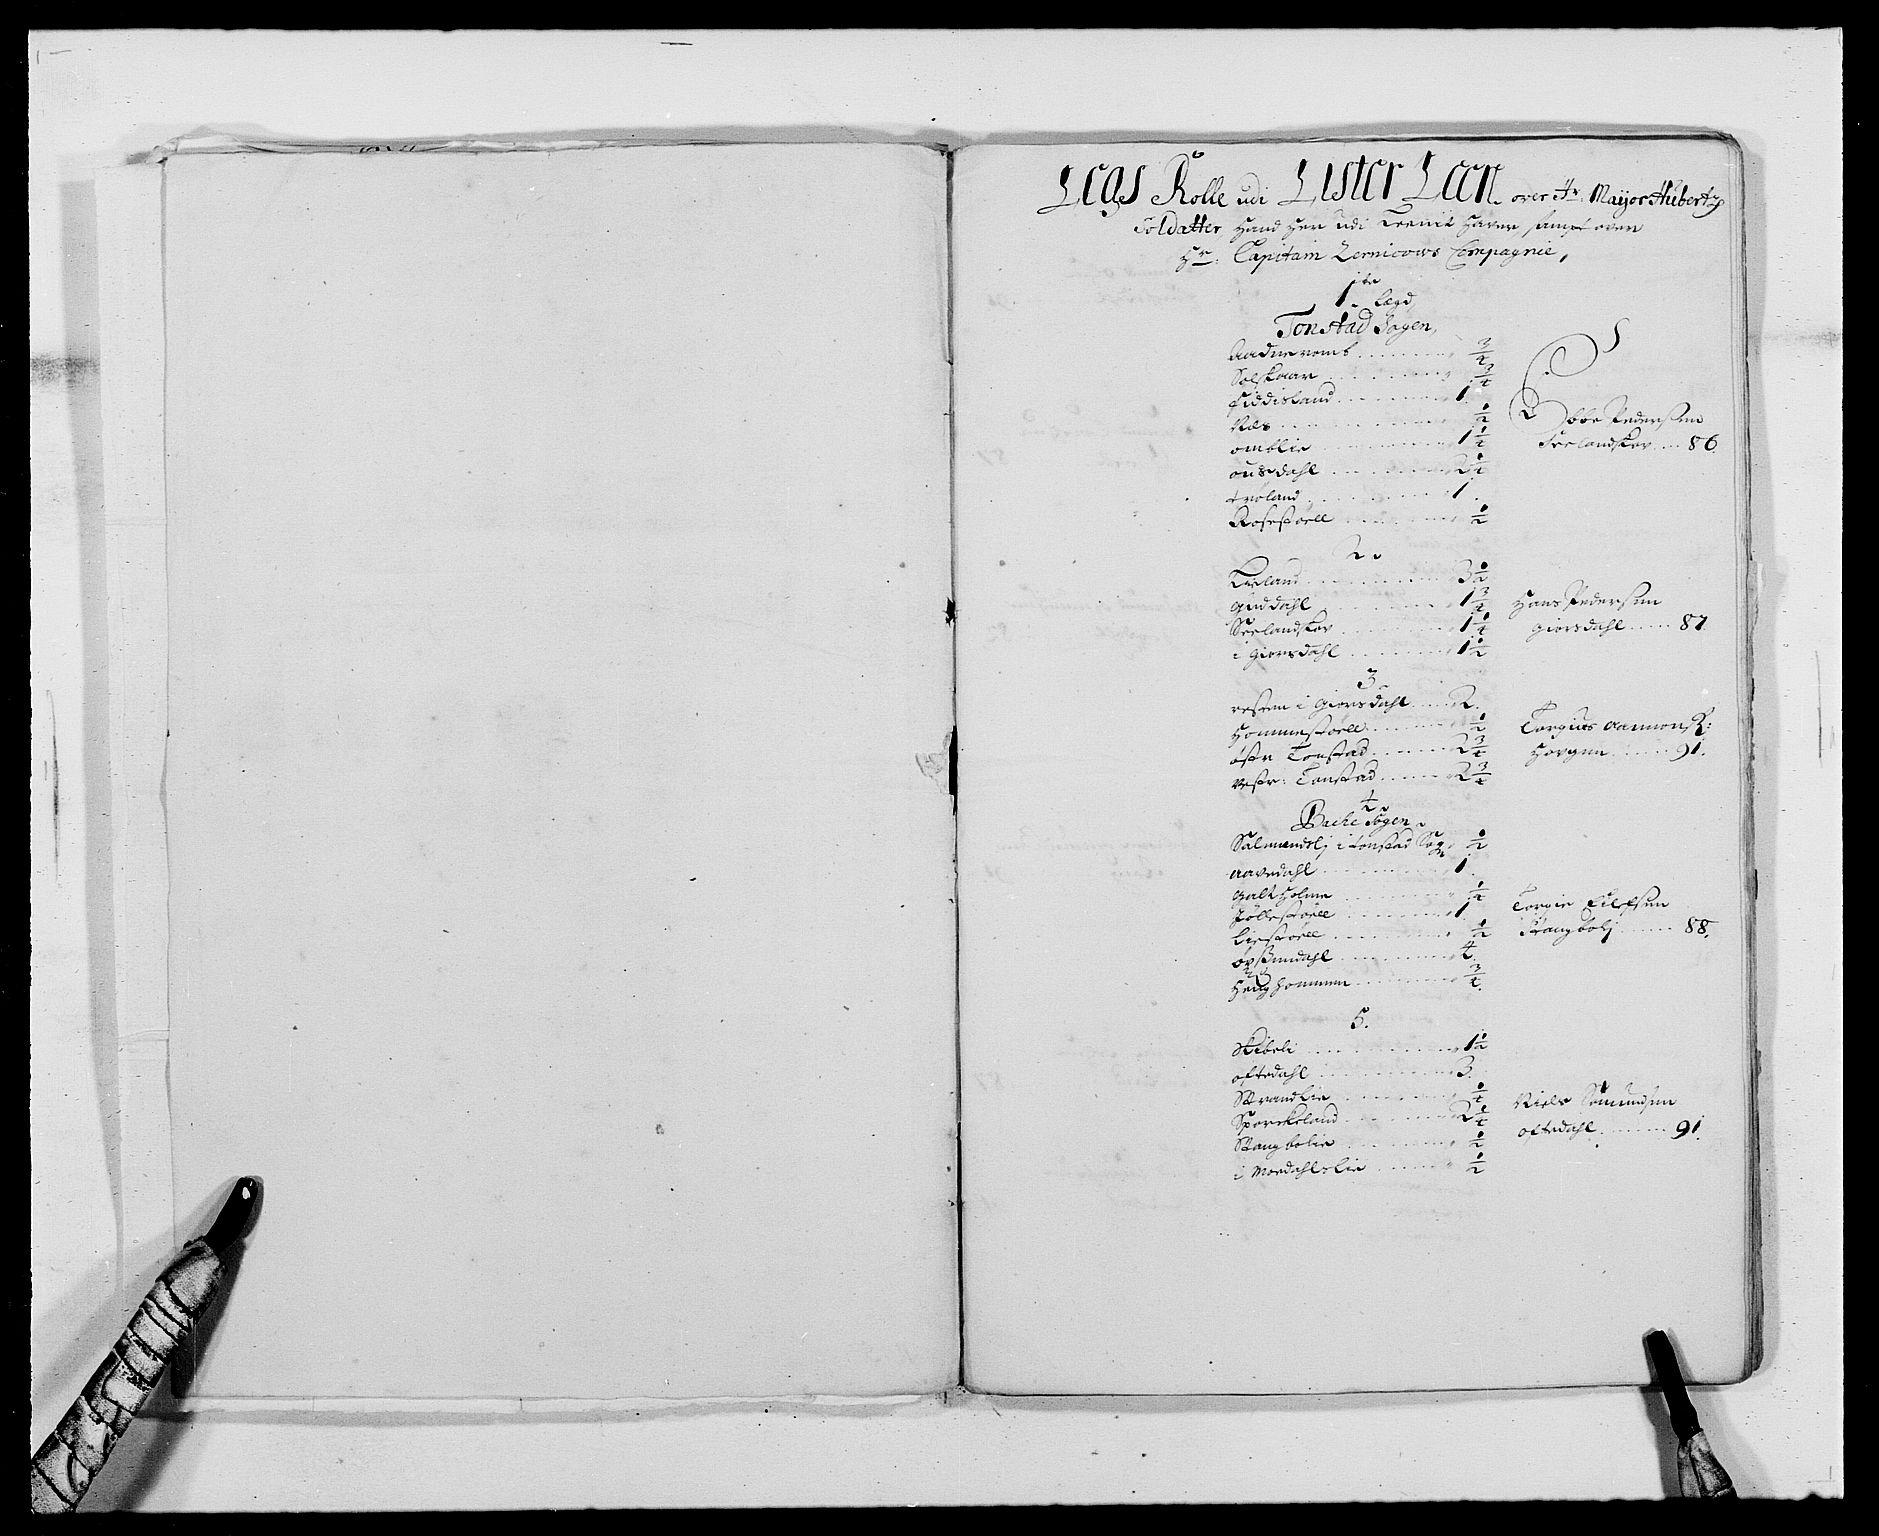 RA, Rentekammeret inntil 1814, Reviderte regnskaper, Fogderegnskap, R41/L2536: Fogderegnskap Lista, 1690-1693, s. 379